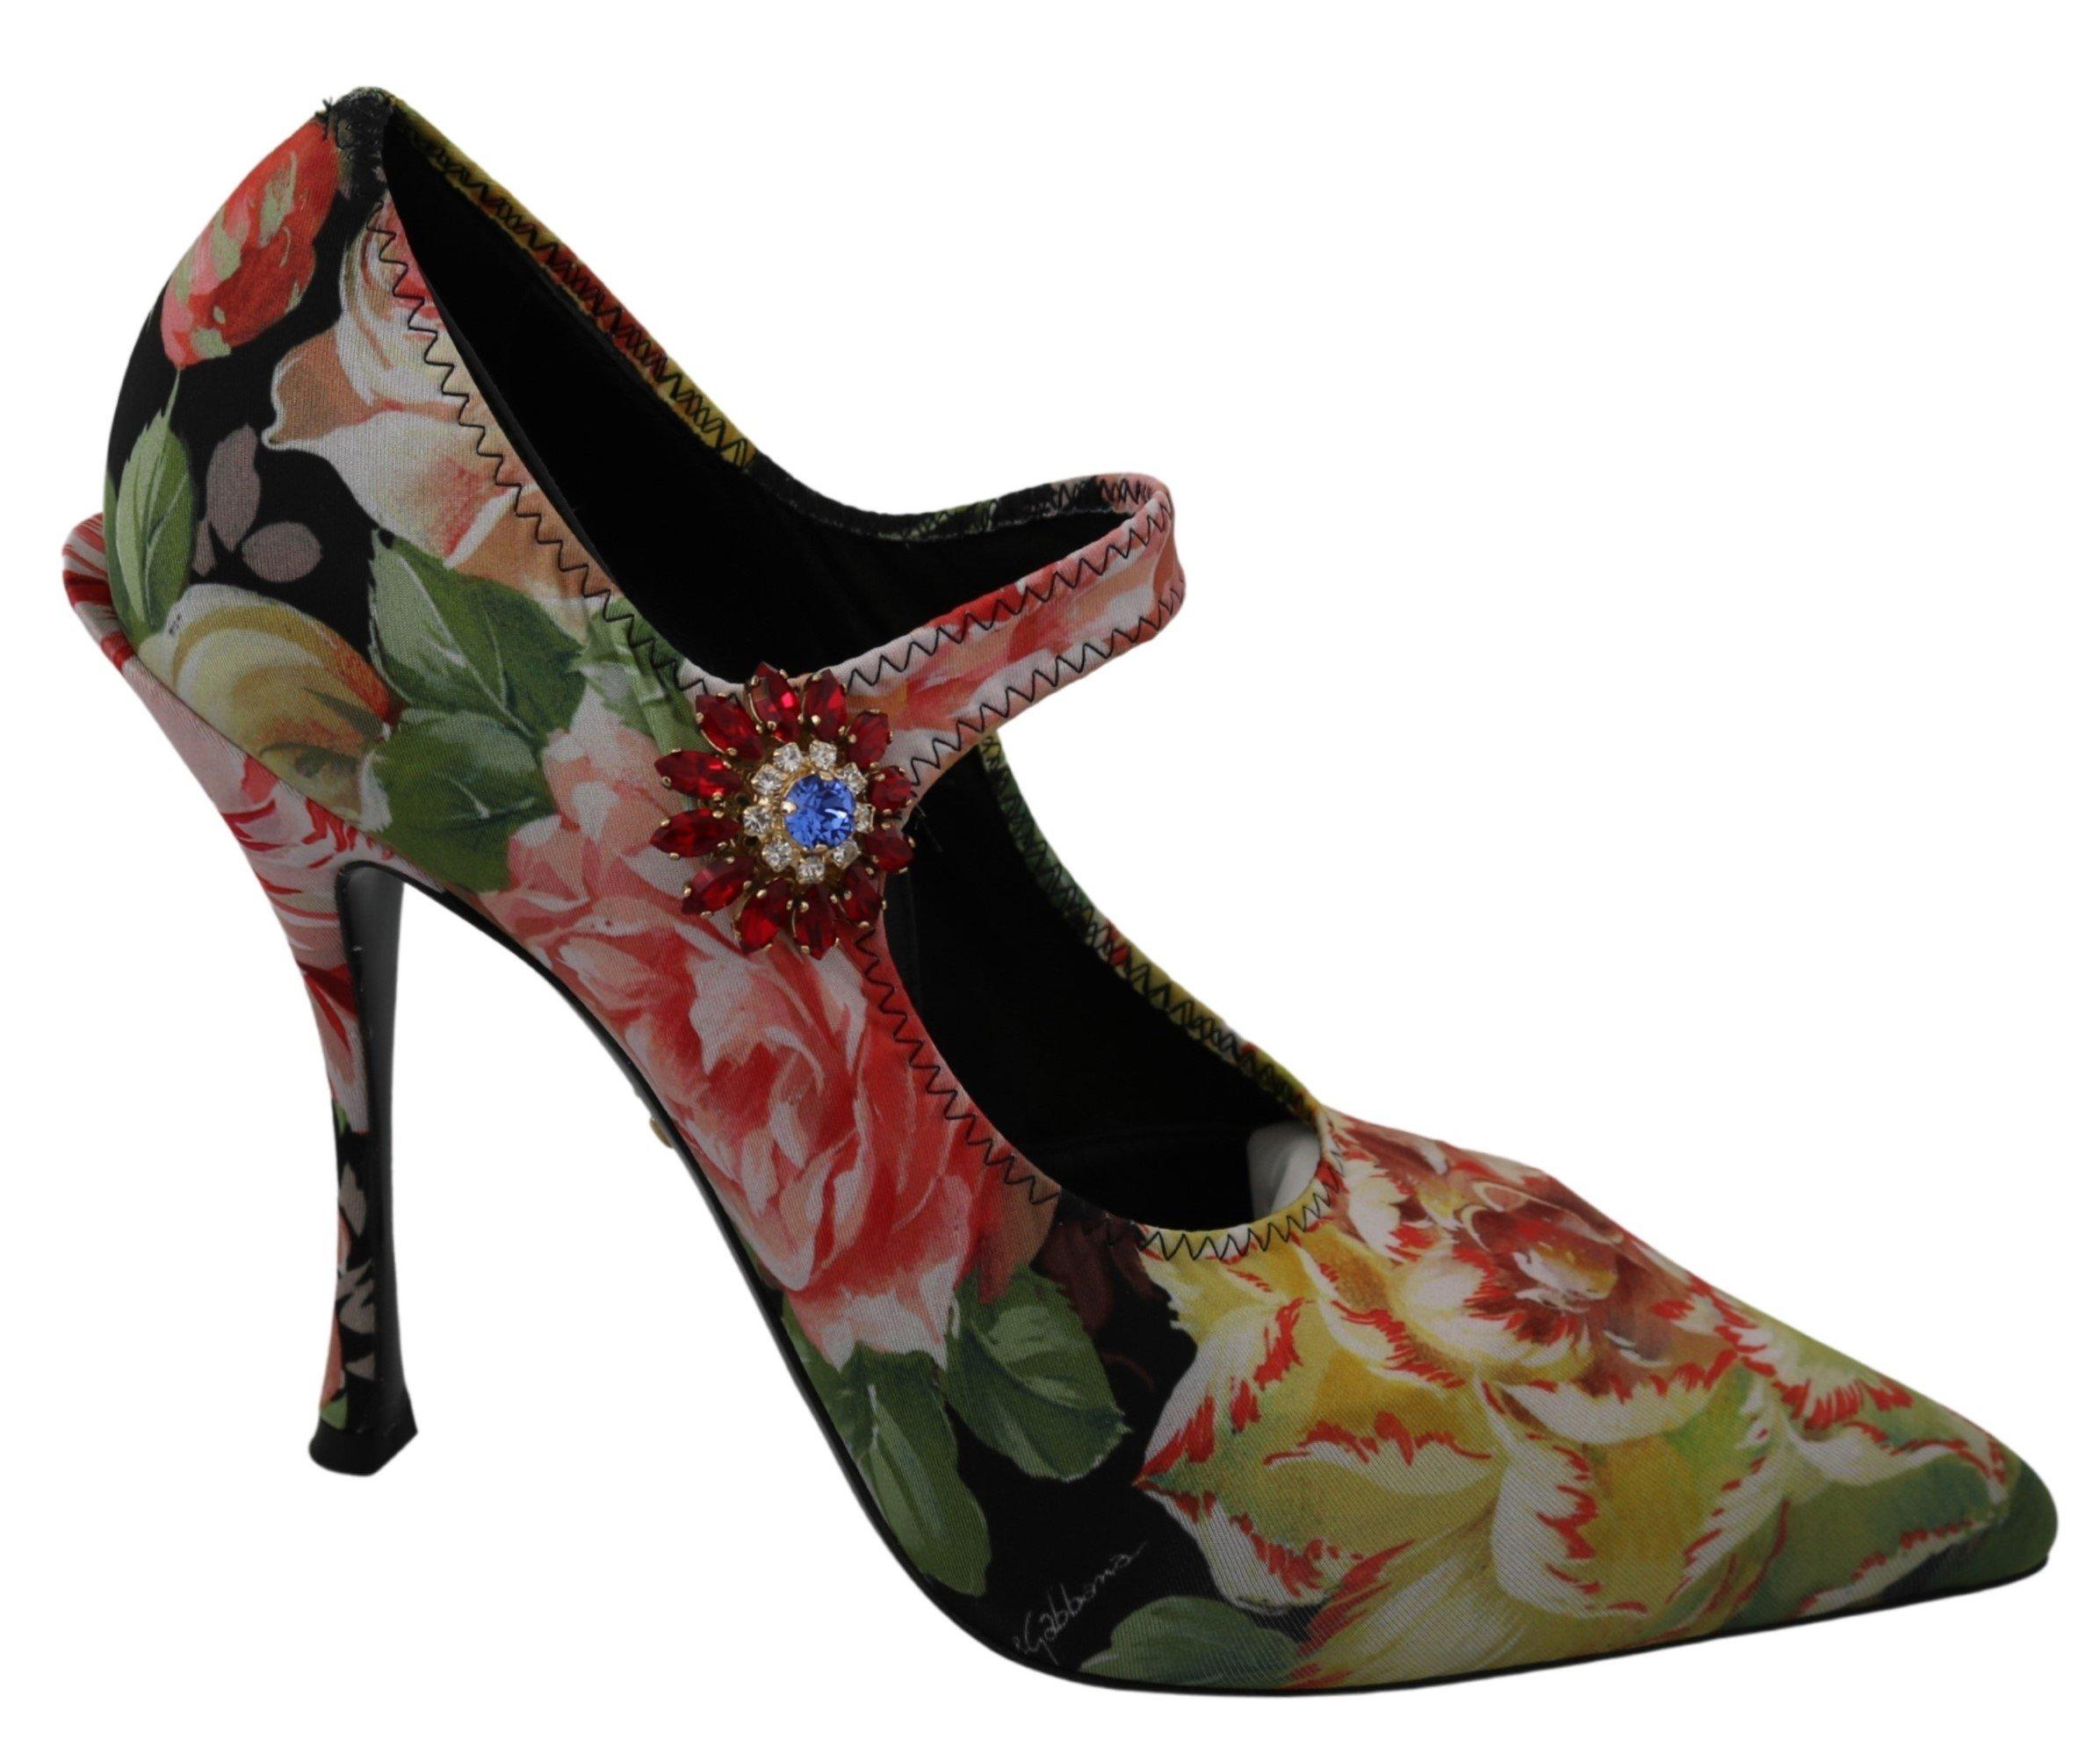 Dolce & Gabbana Women's Neoprene Mary Janes Crystal Pumps Black LA7371 - EU40/US9.5